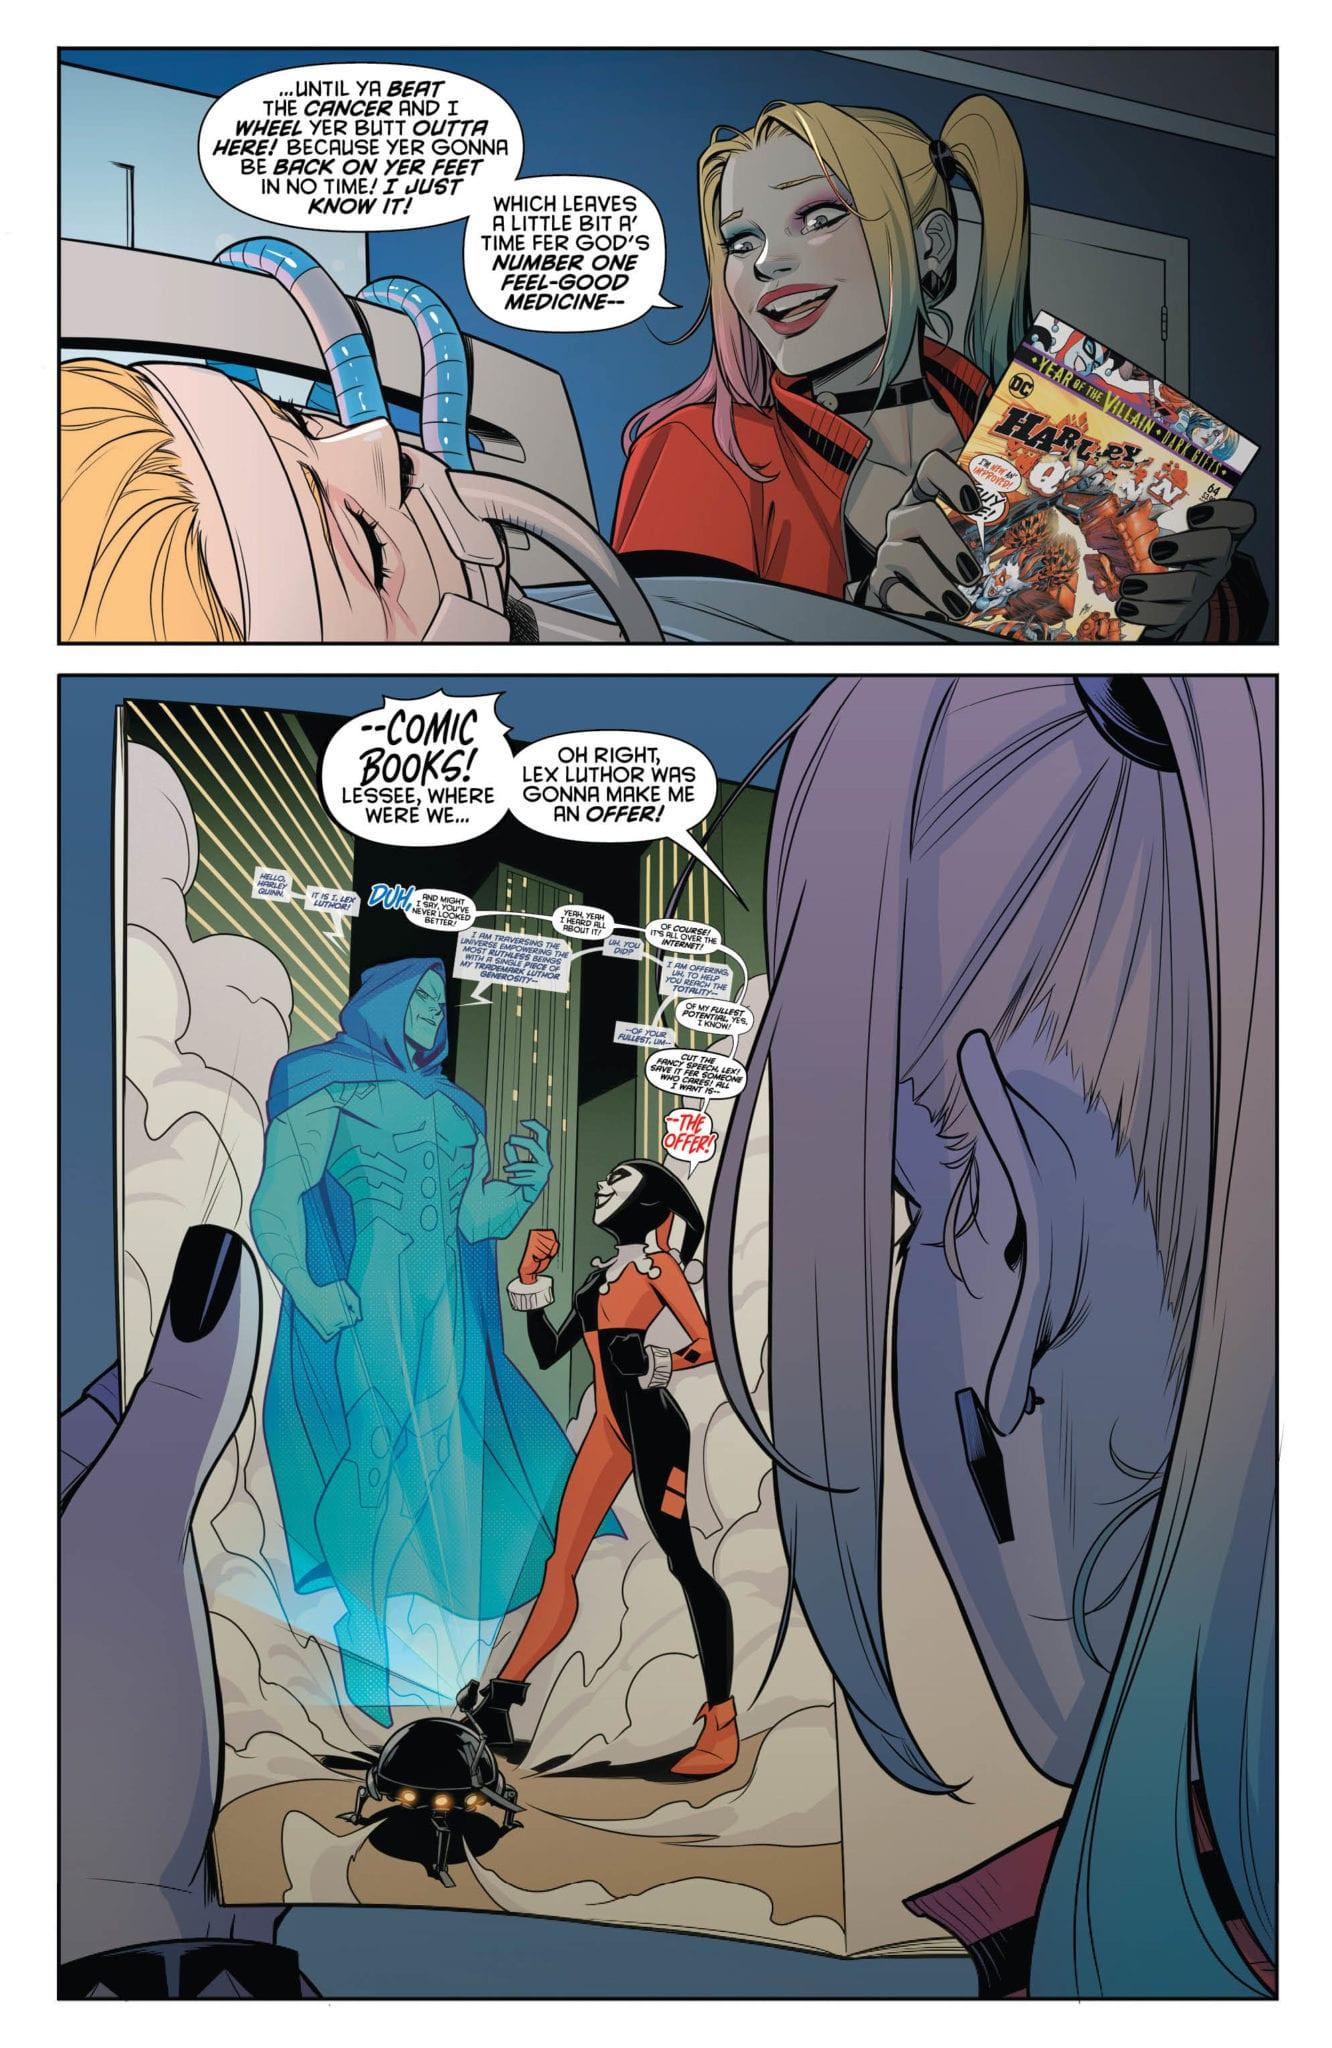 DC Comics Exclusive Preview: HARLEY QUINN #64 - Enter Apex Lex! 2